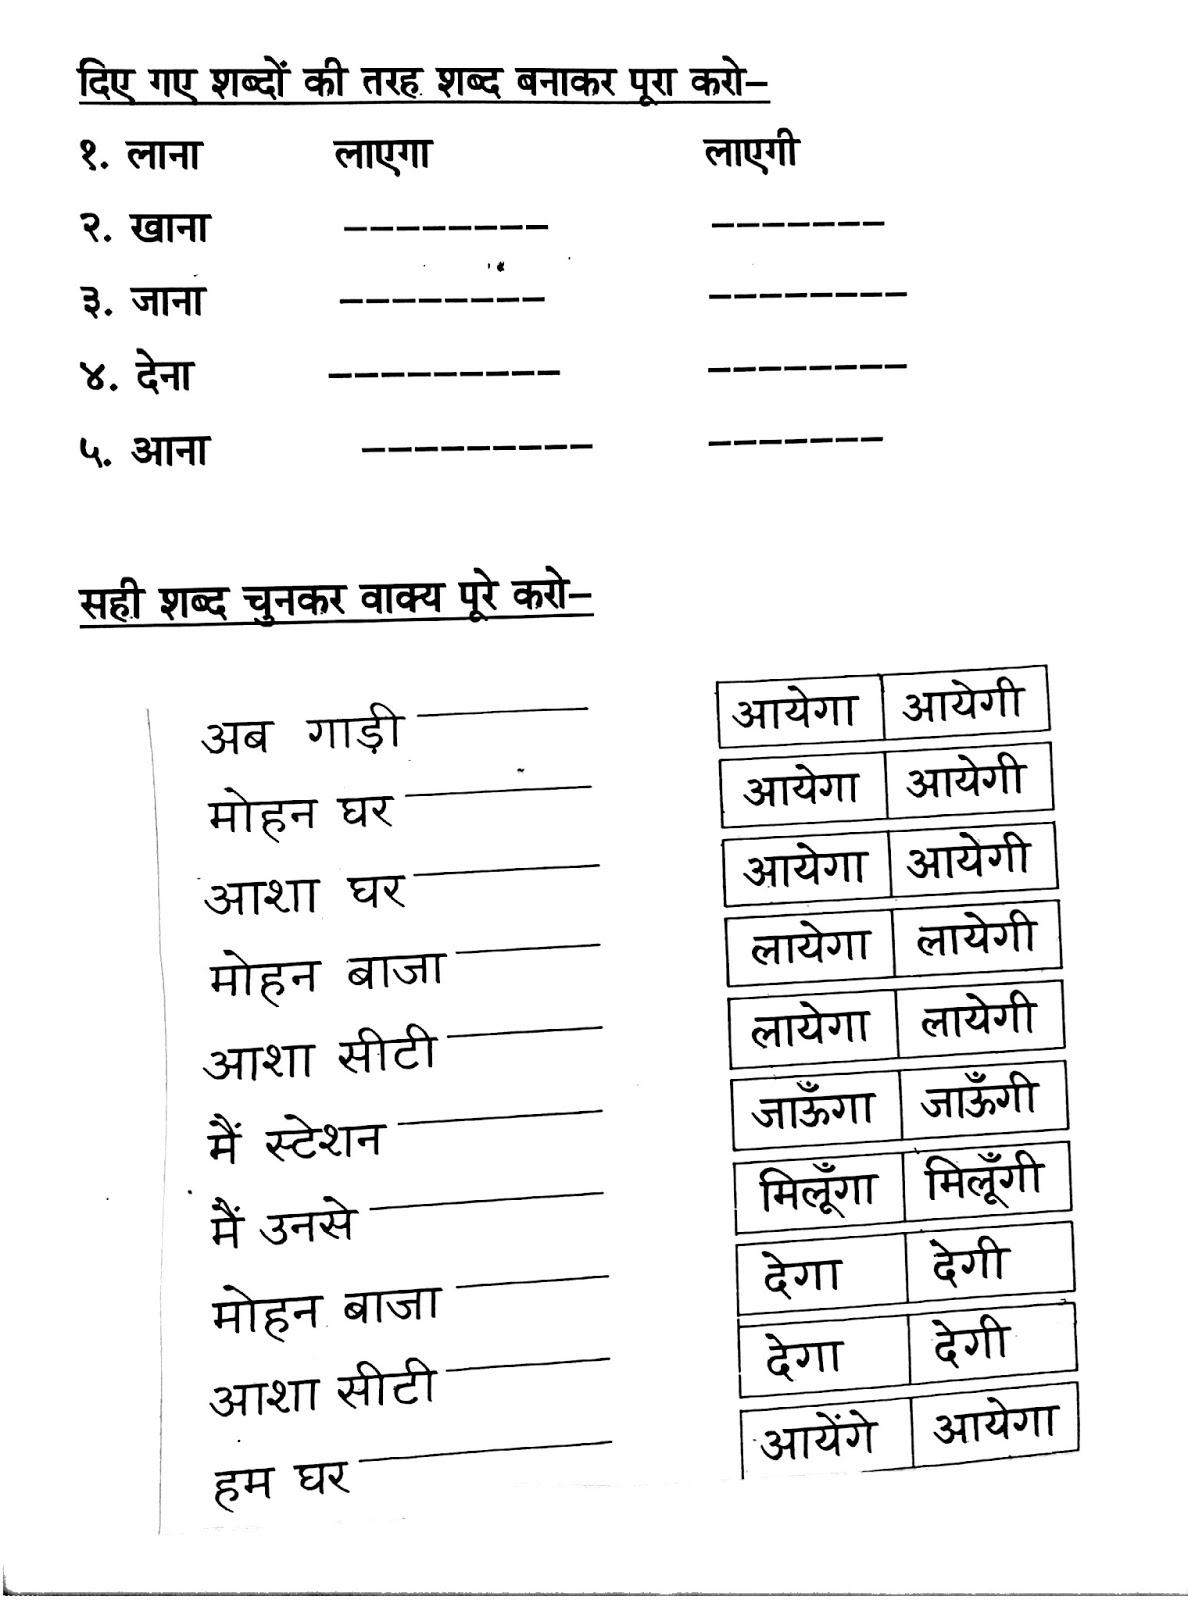 medium resolution of Hindi Kaal Worksheet   Printable Worksheets and Activities for Teachers